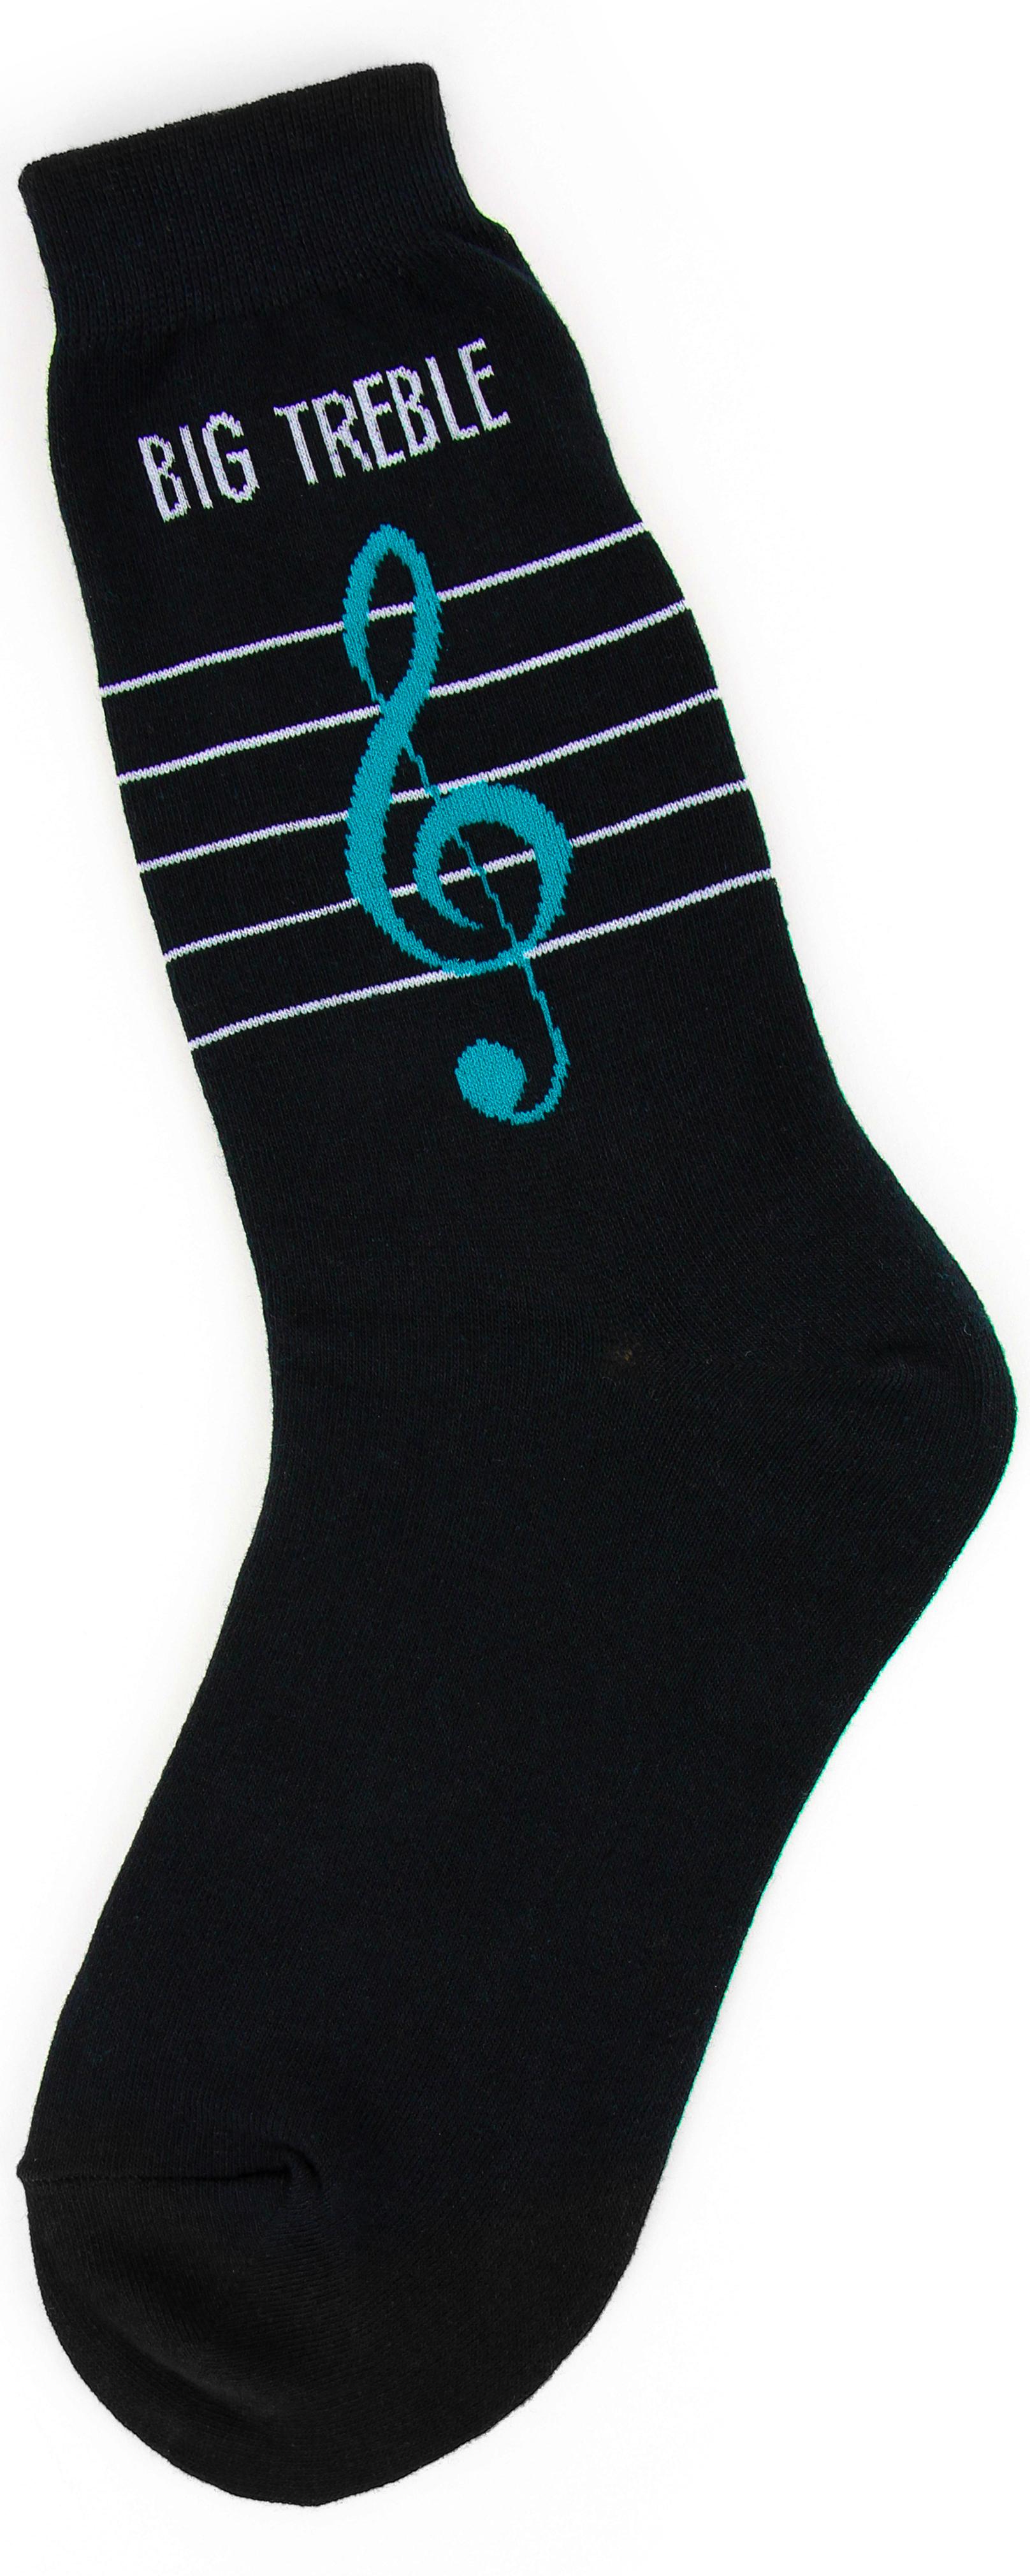 Big Treble Women's Socks-0